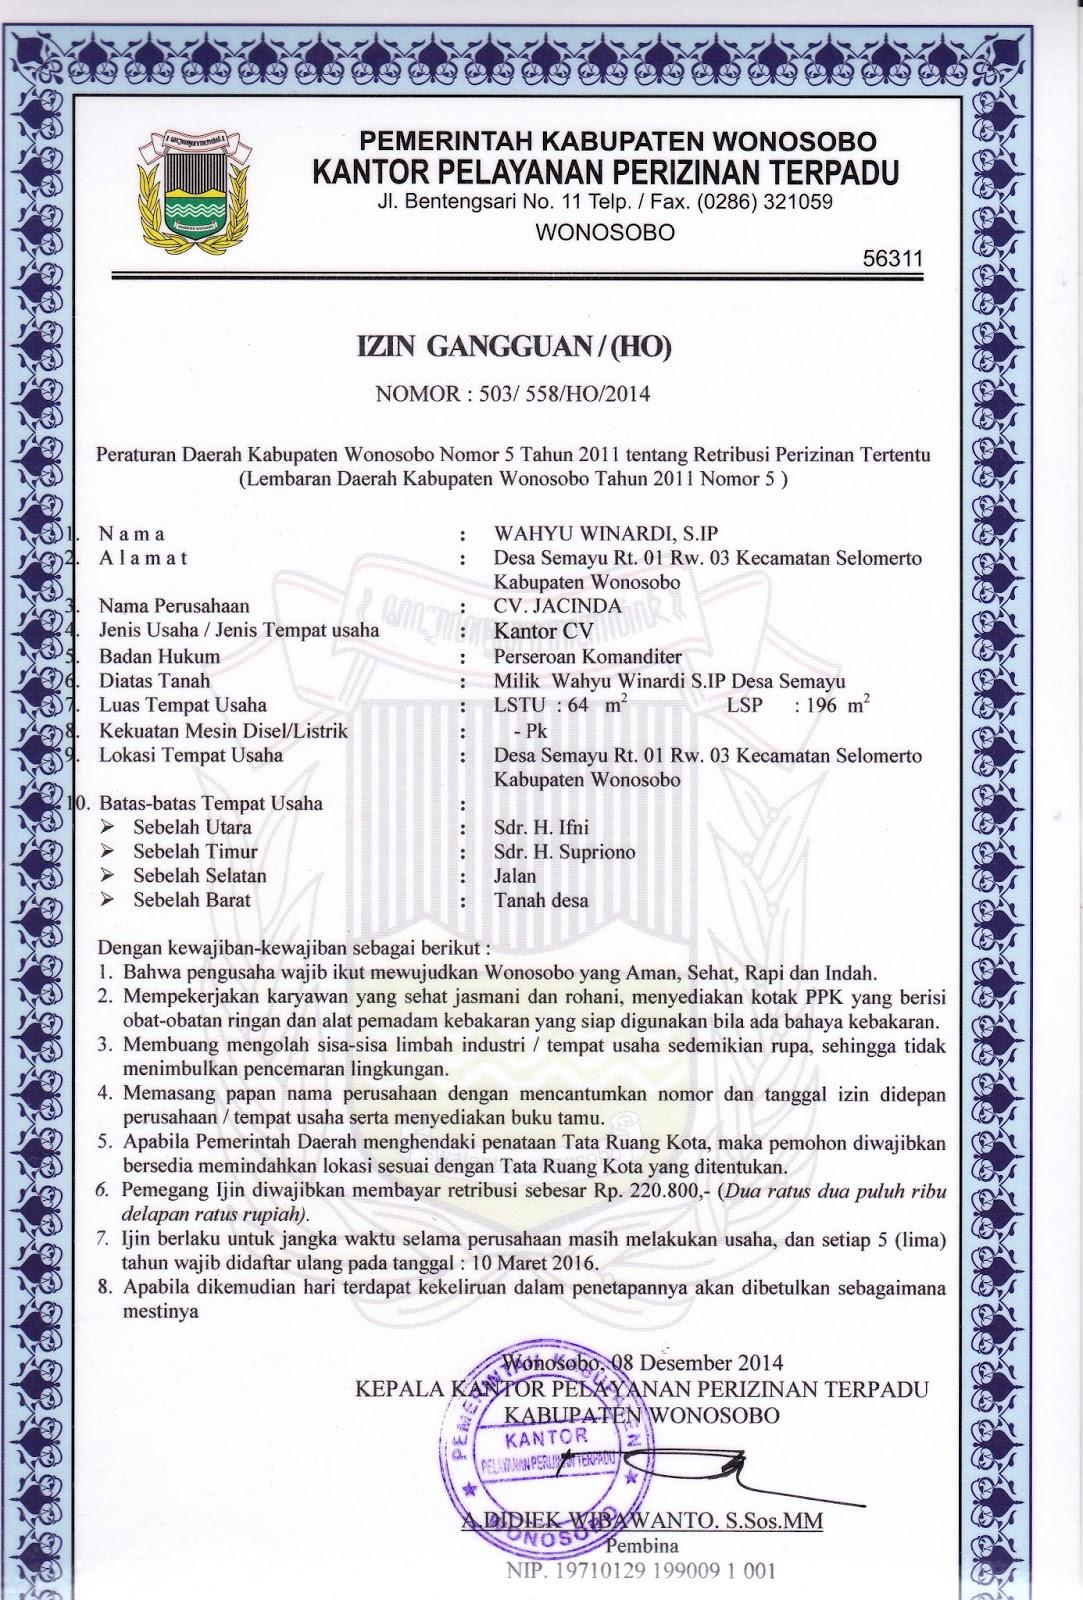 9 Contoh Surat Izin Usaha Situ Siup Npwp Nrp Nrb Amdal Imb